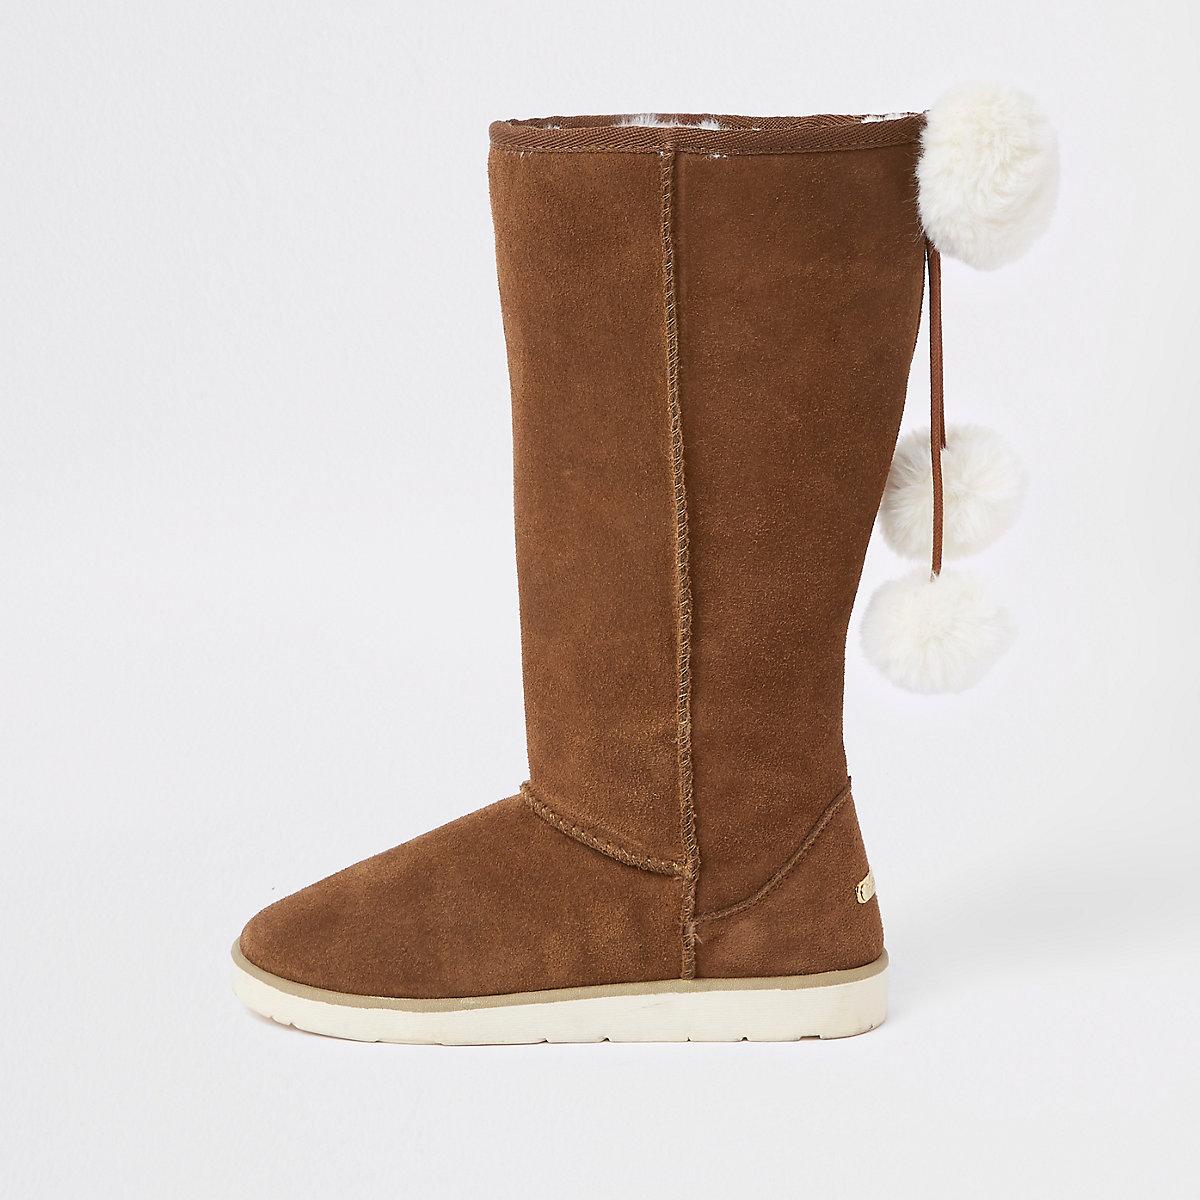 Light brown suede faux fur pom pom boots